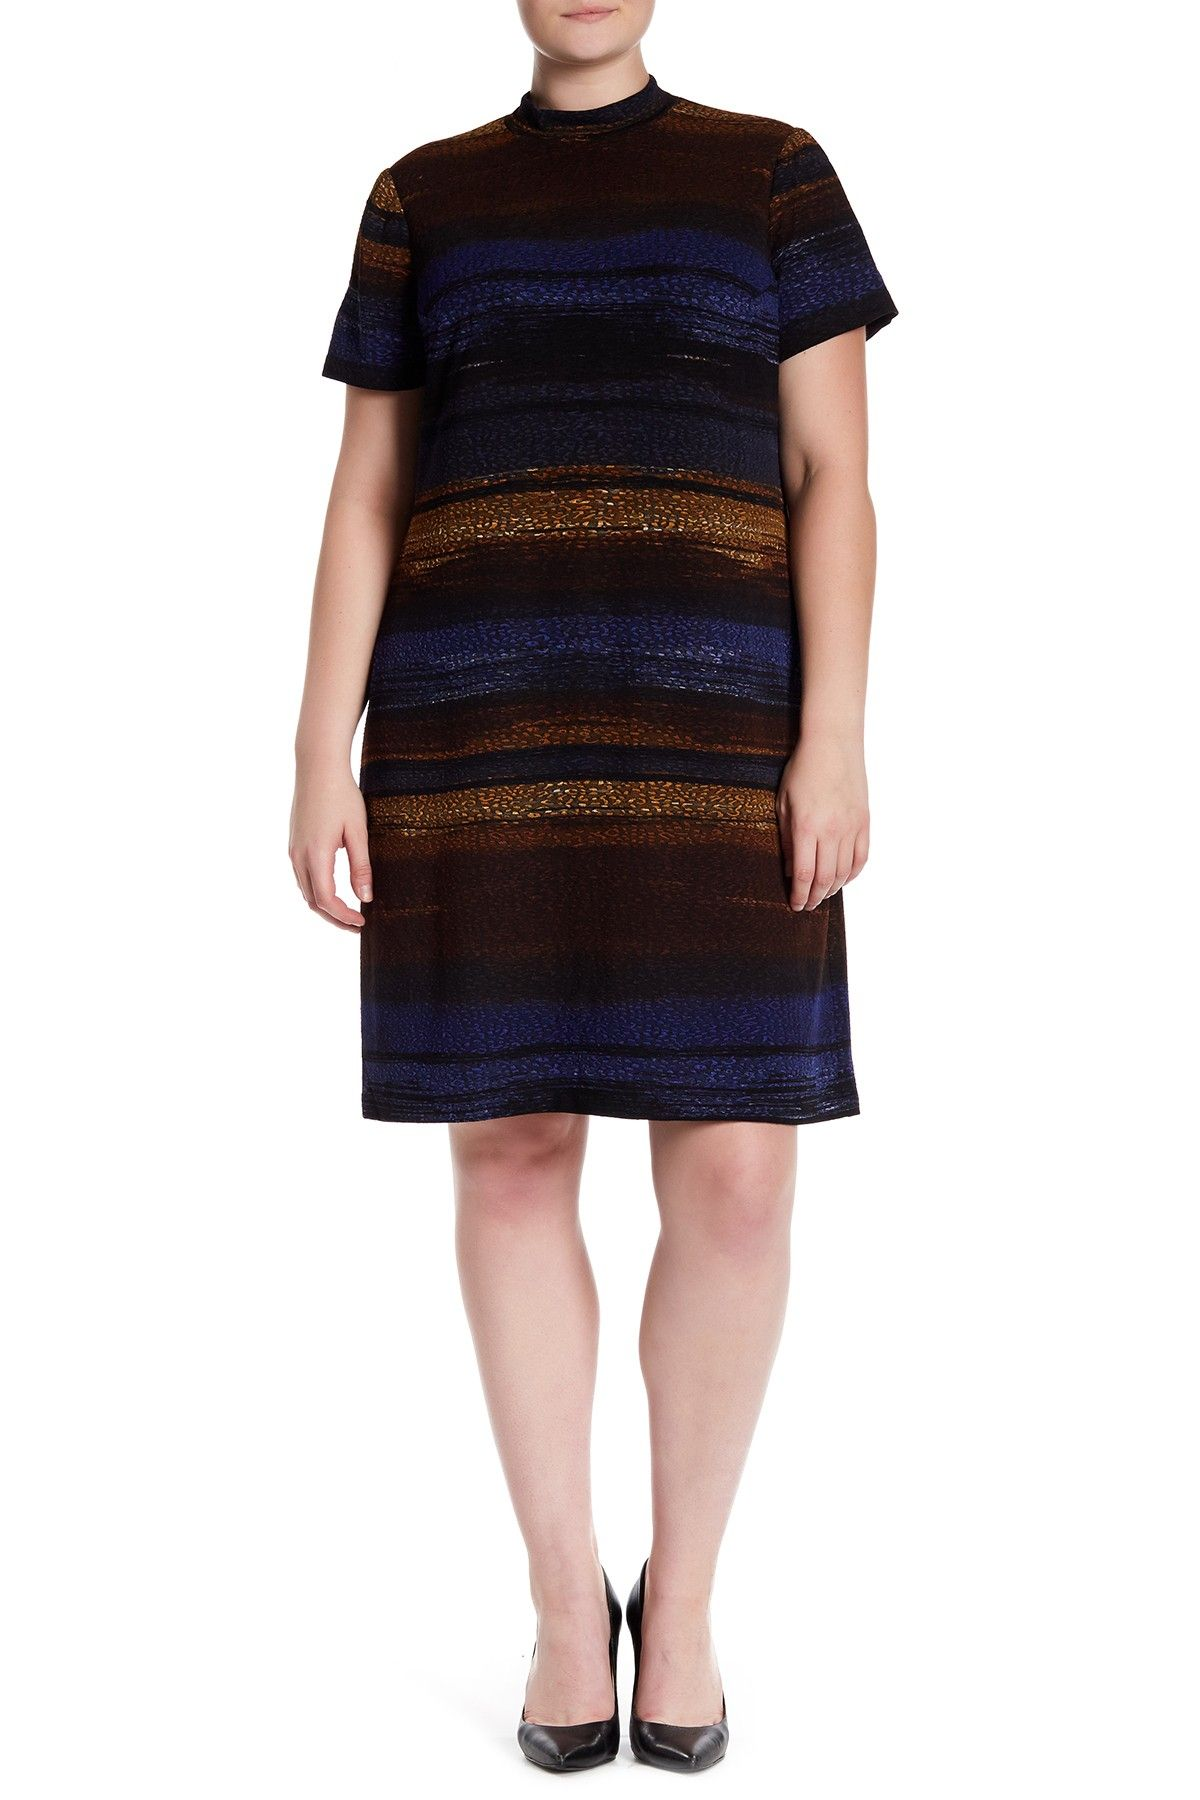 London times autumn ombre stripe short sleeve print dress plus